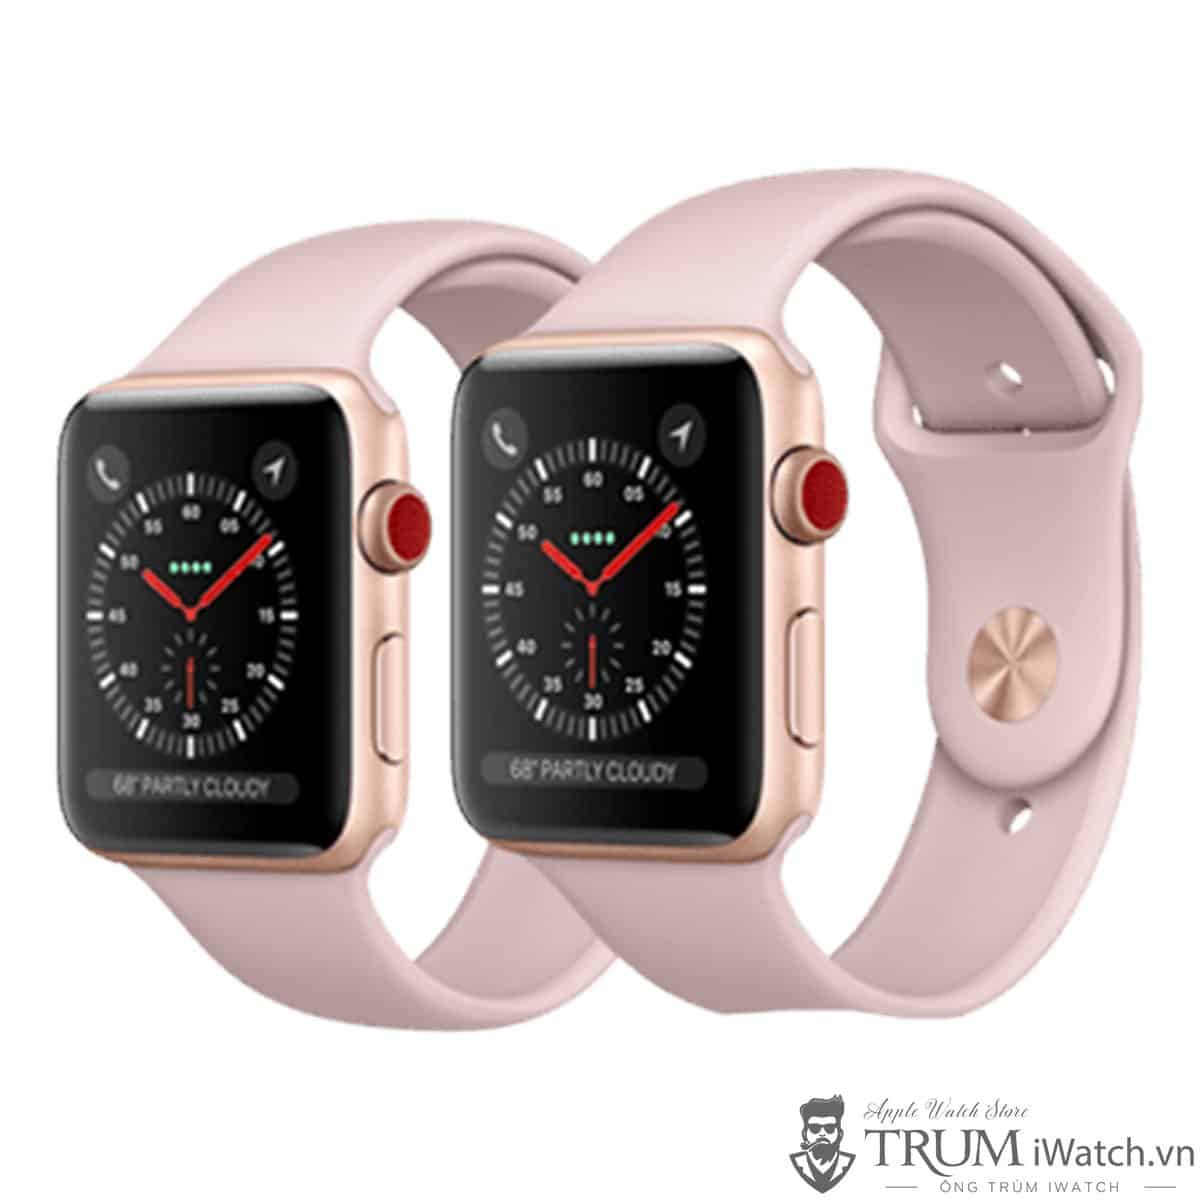 Mua Đồng Hồ Apple Watch Series 3 38mm Nhôm LTE Mới 100% Fullbox